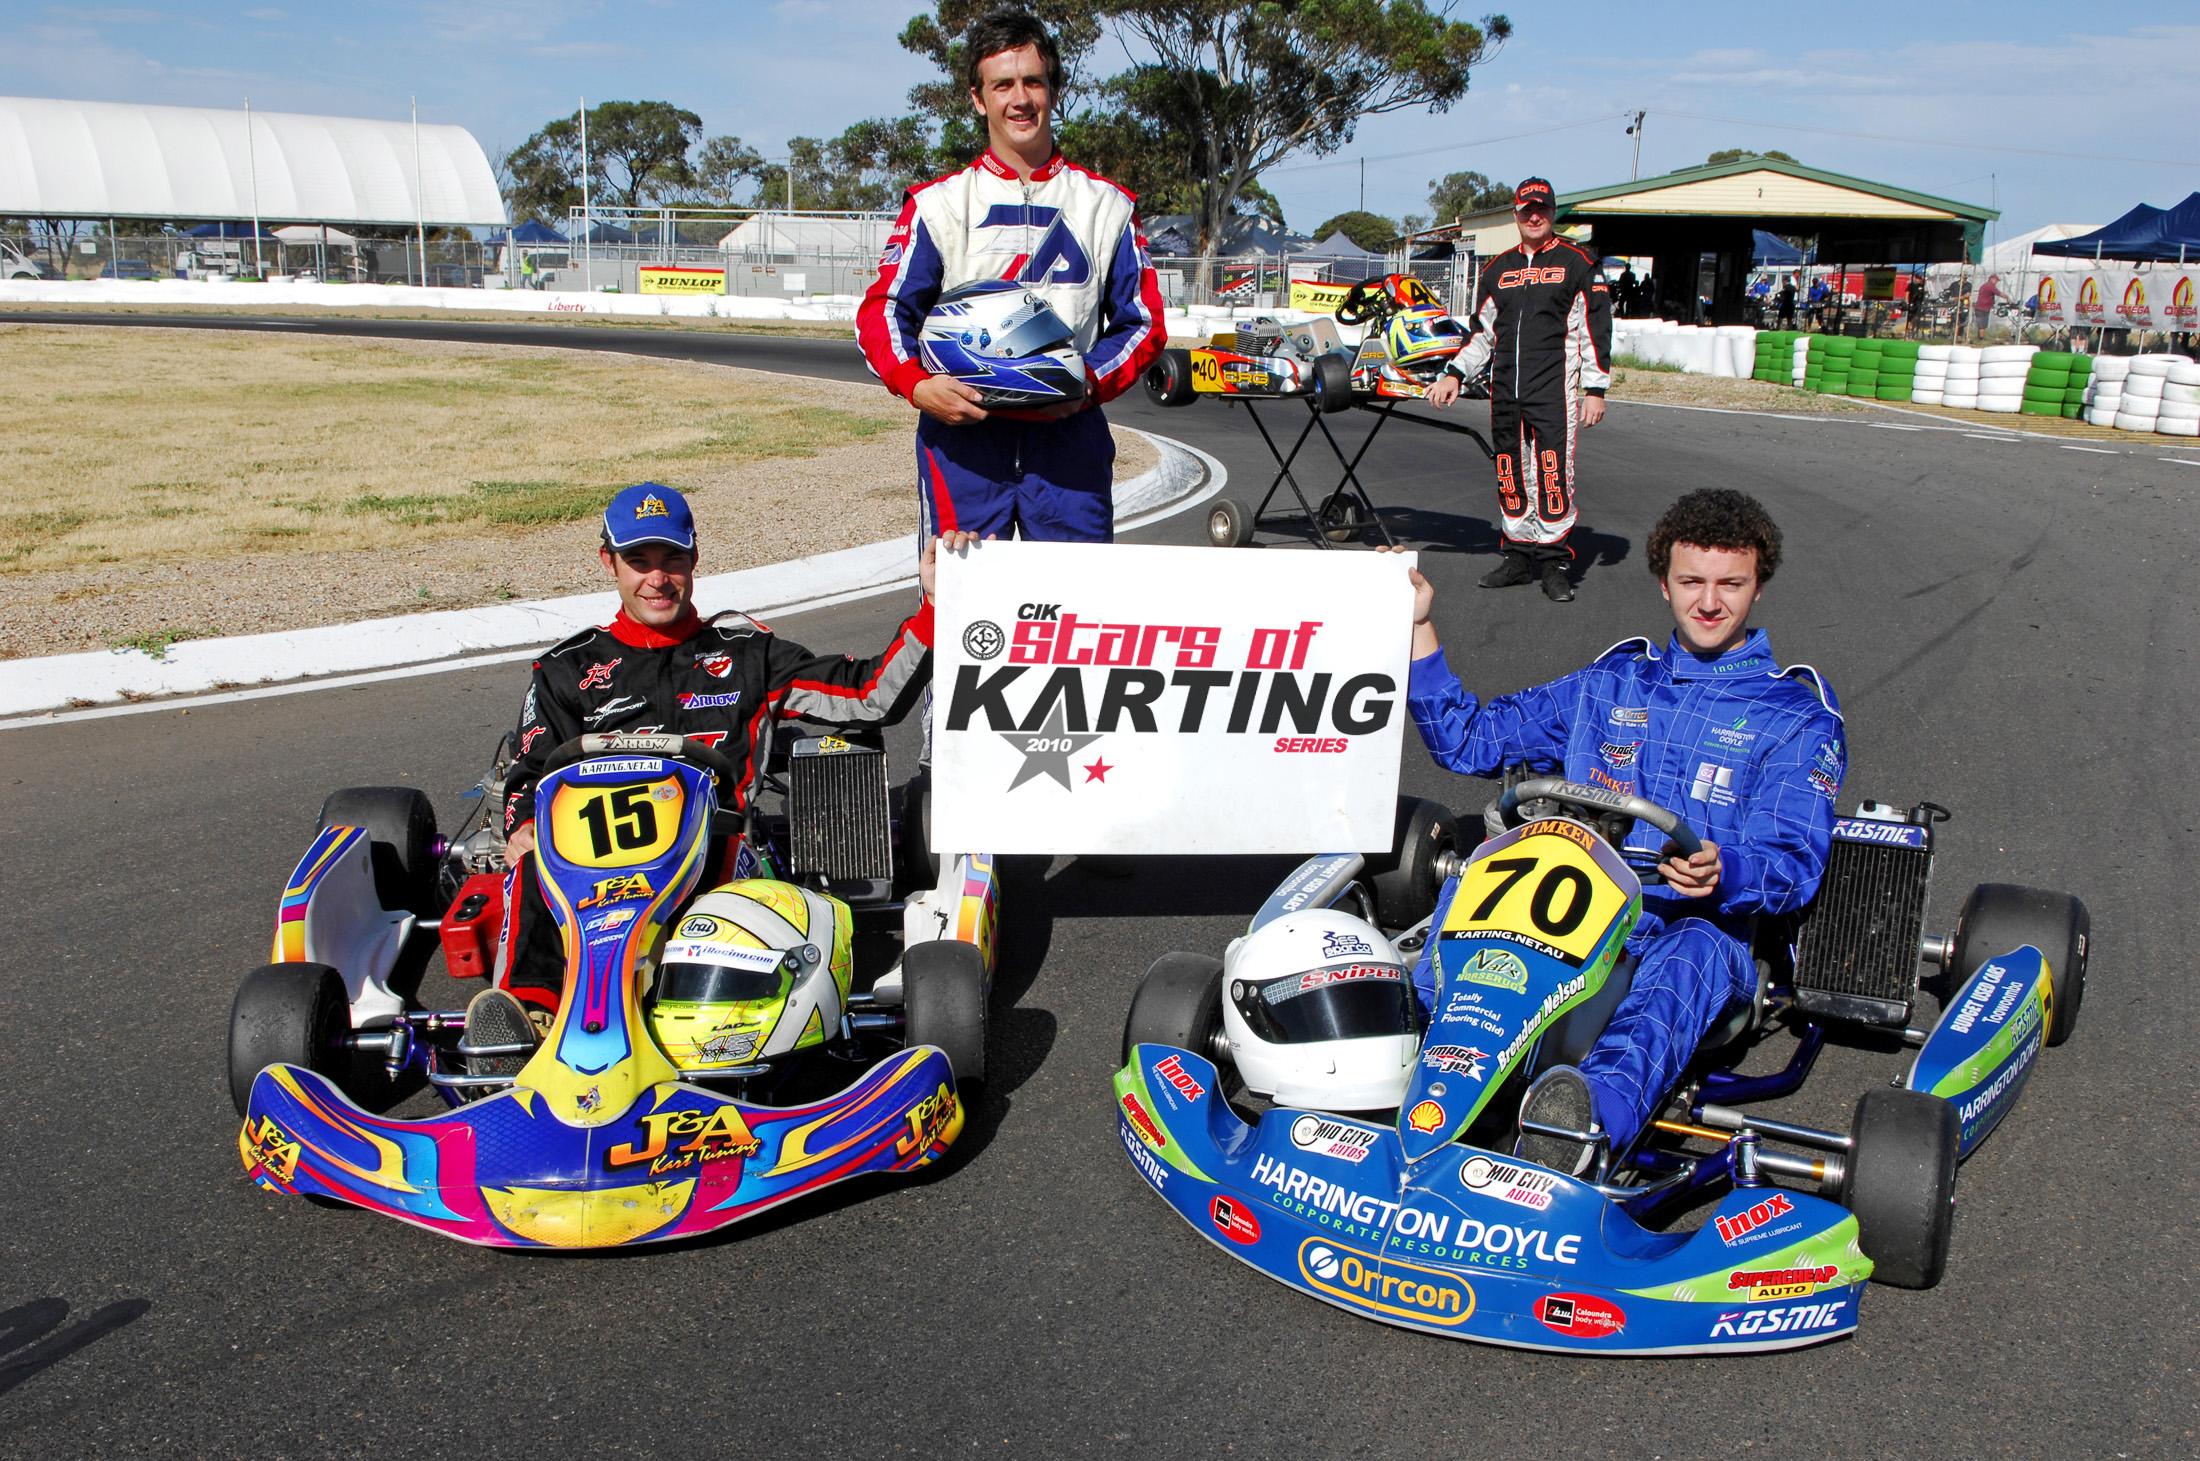 2009: Stars of Karting set to shine in 2010